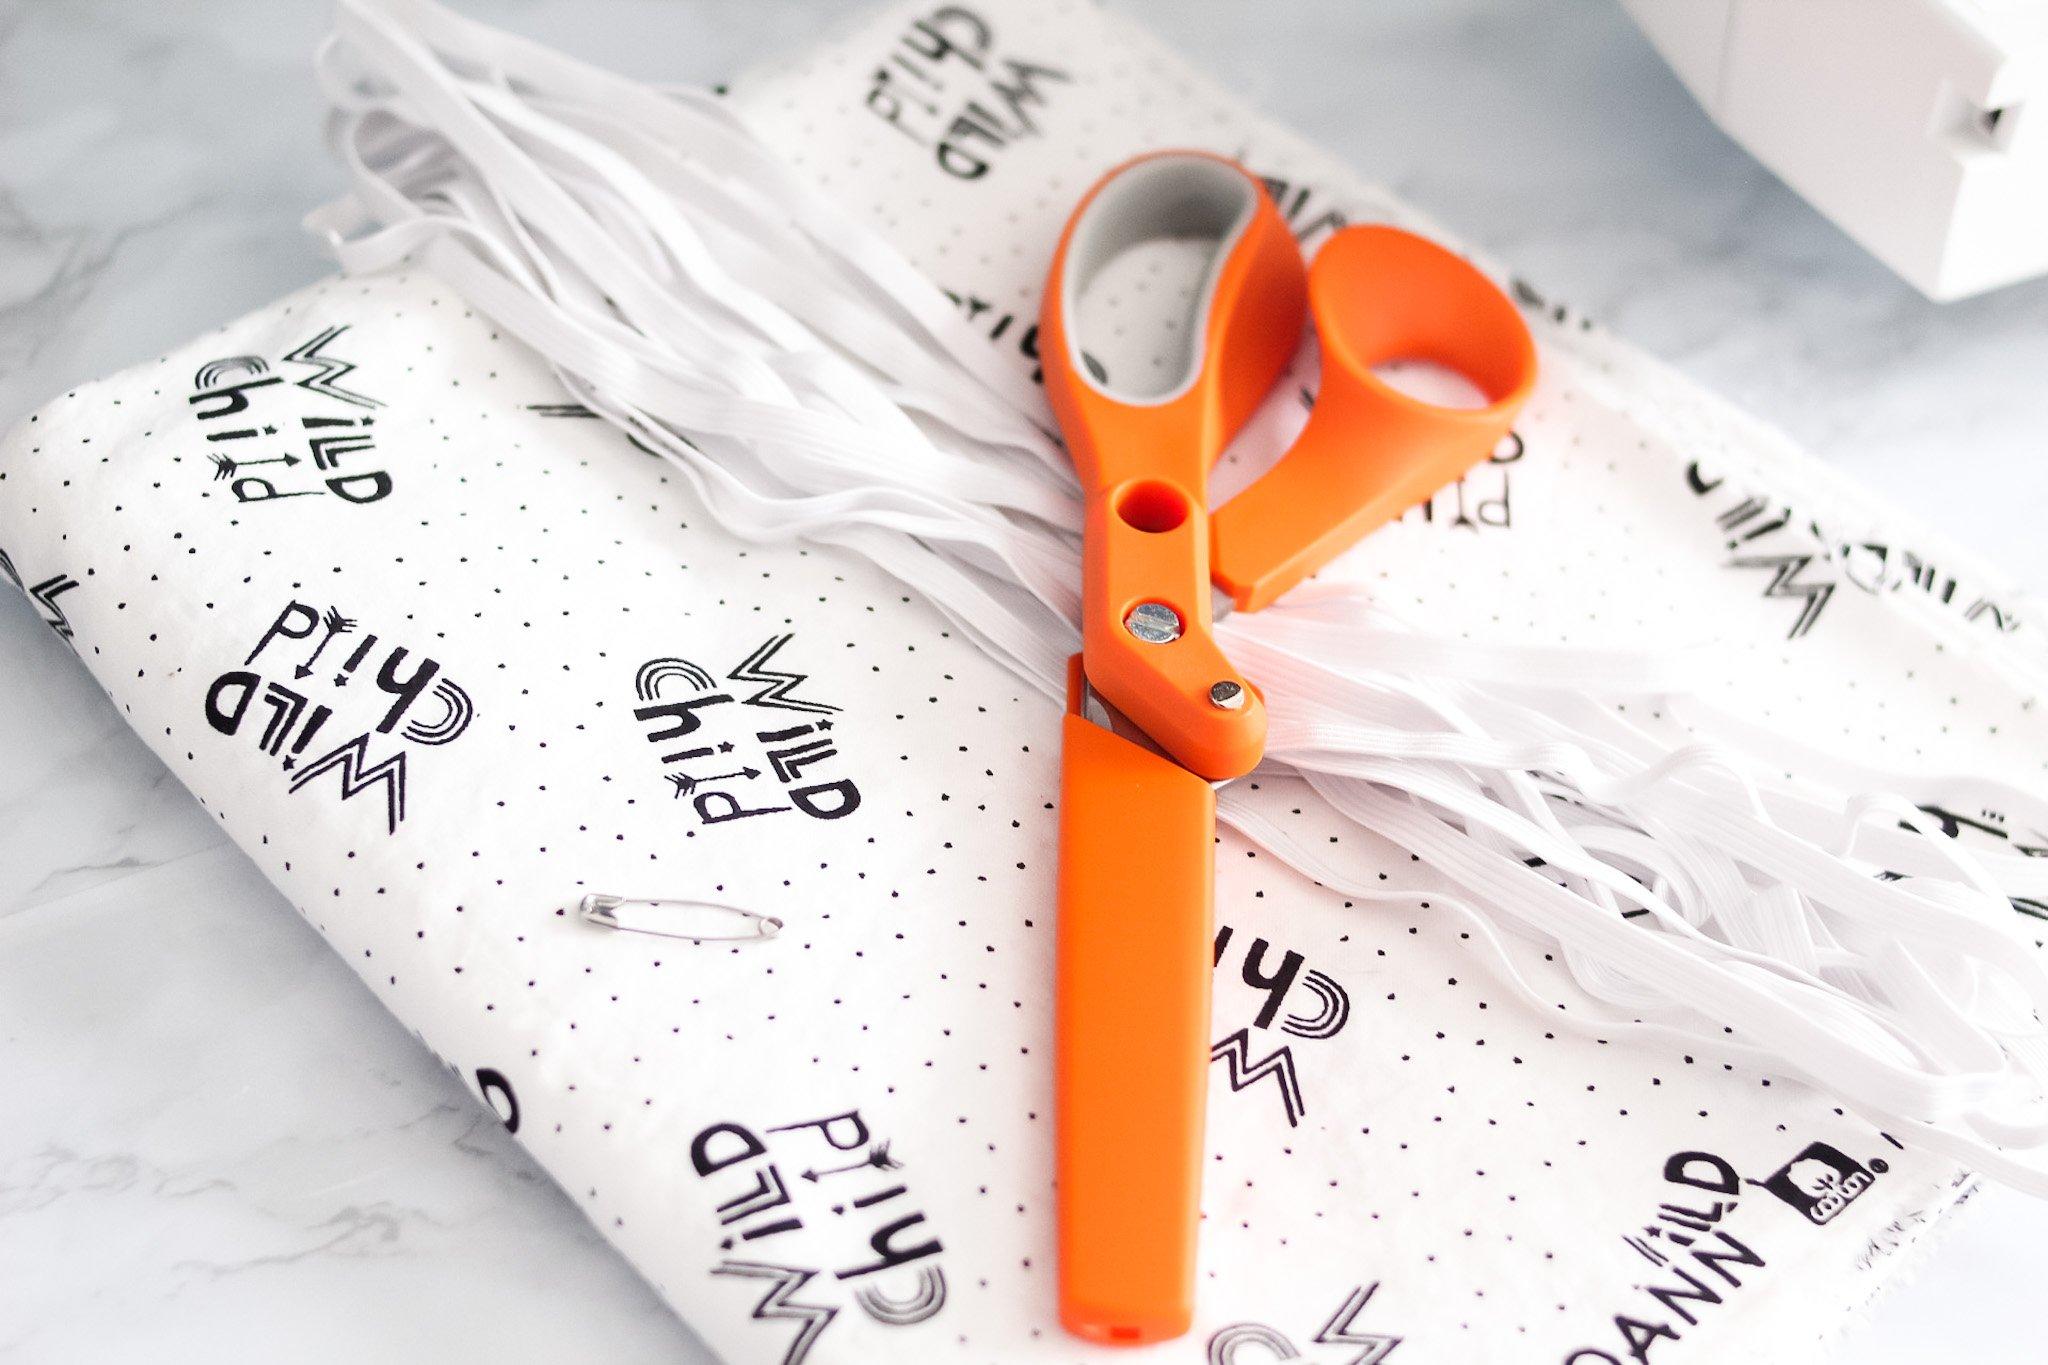 DIY crib sheet materials